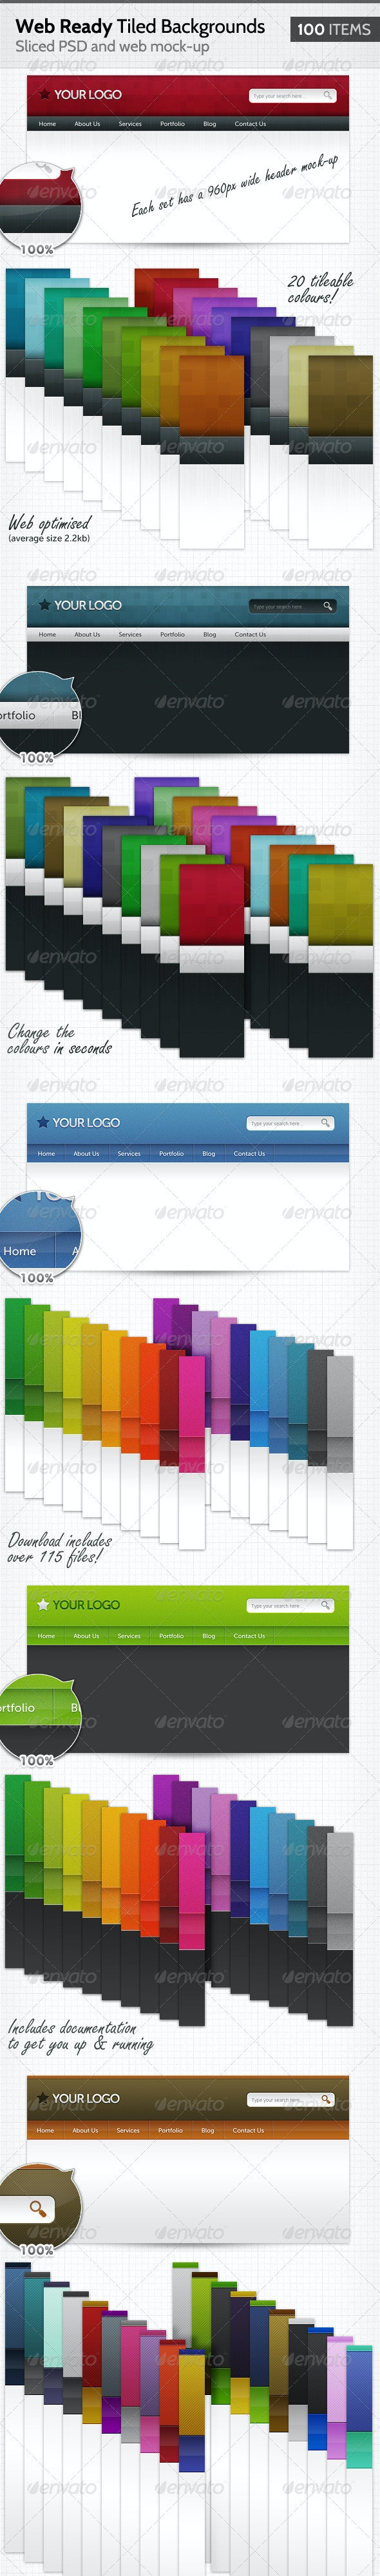 100 Web Ready Tiled Backgrounds - Web Elements